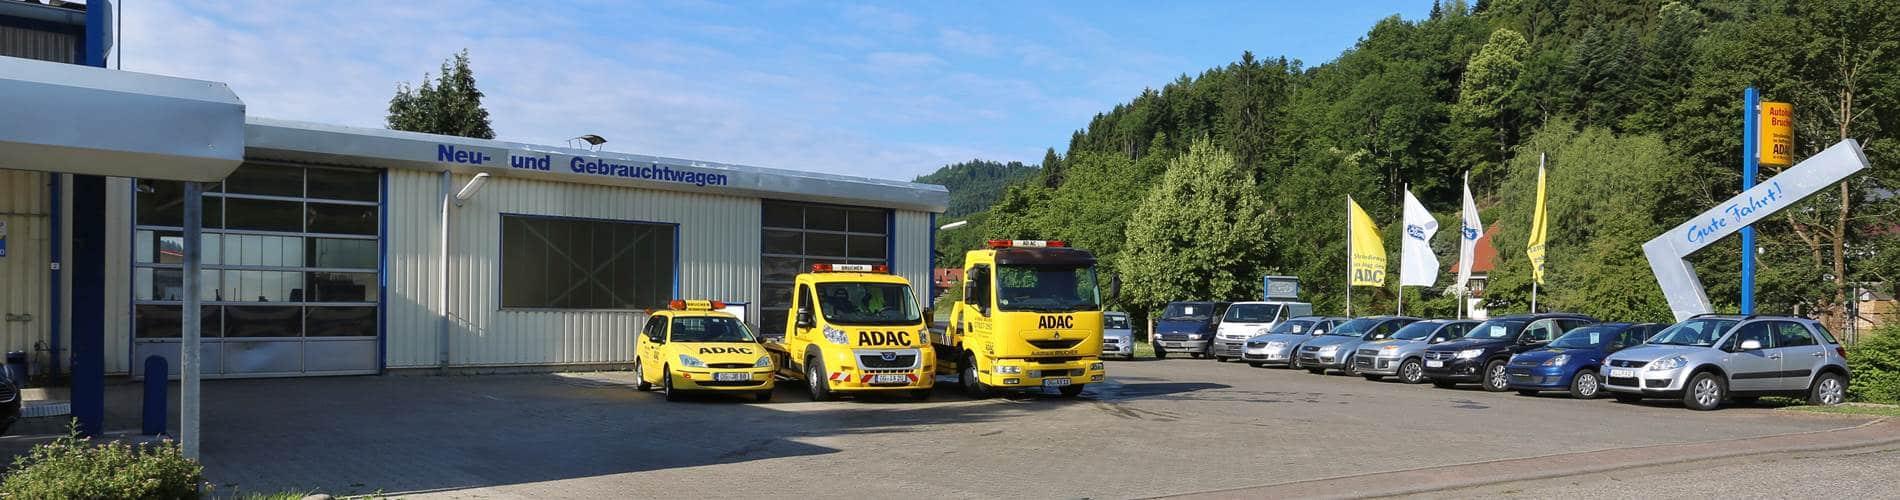 Autoservice Brucher Nordrach